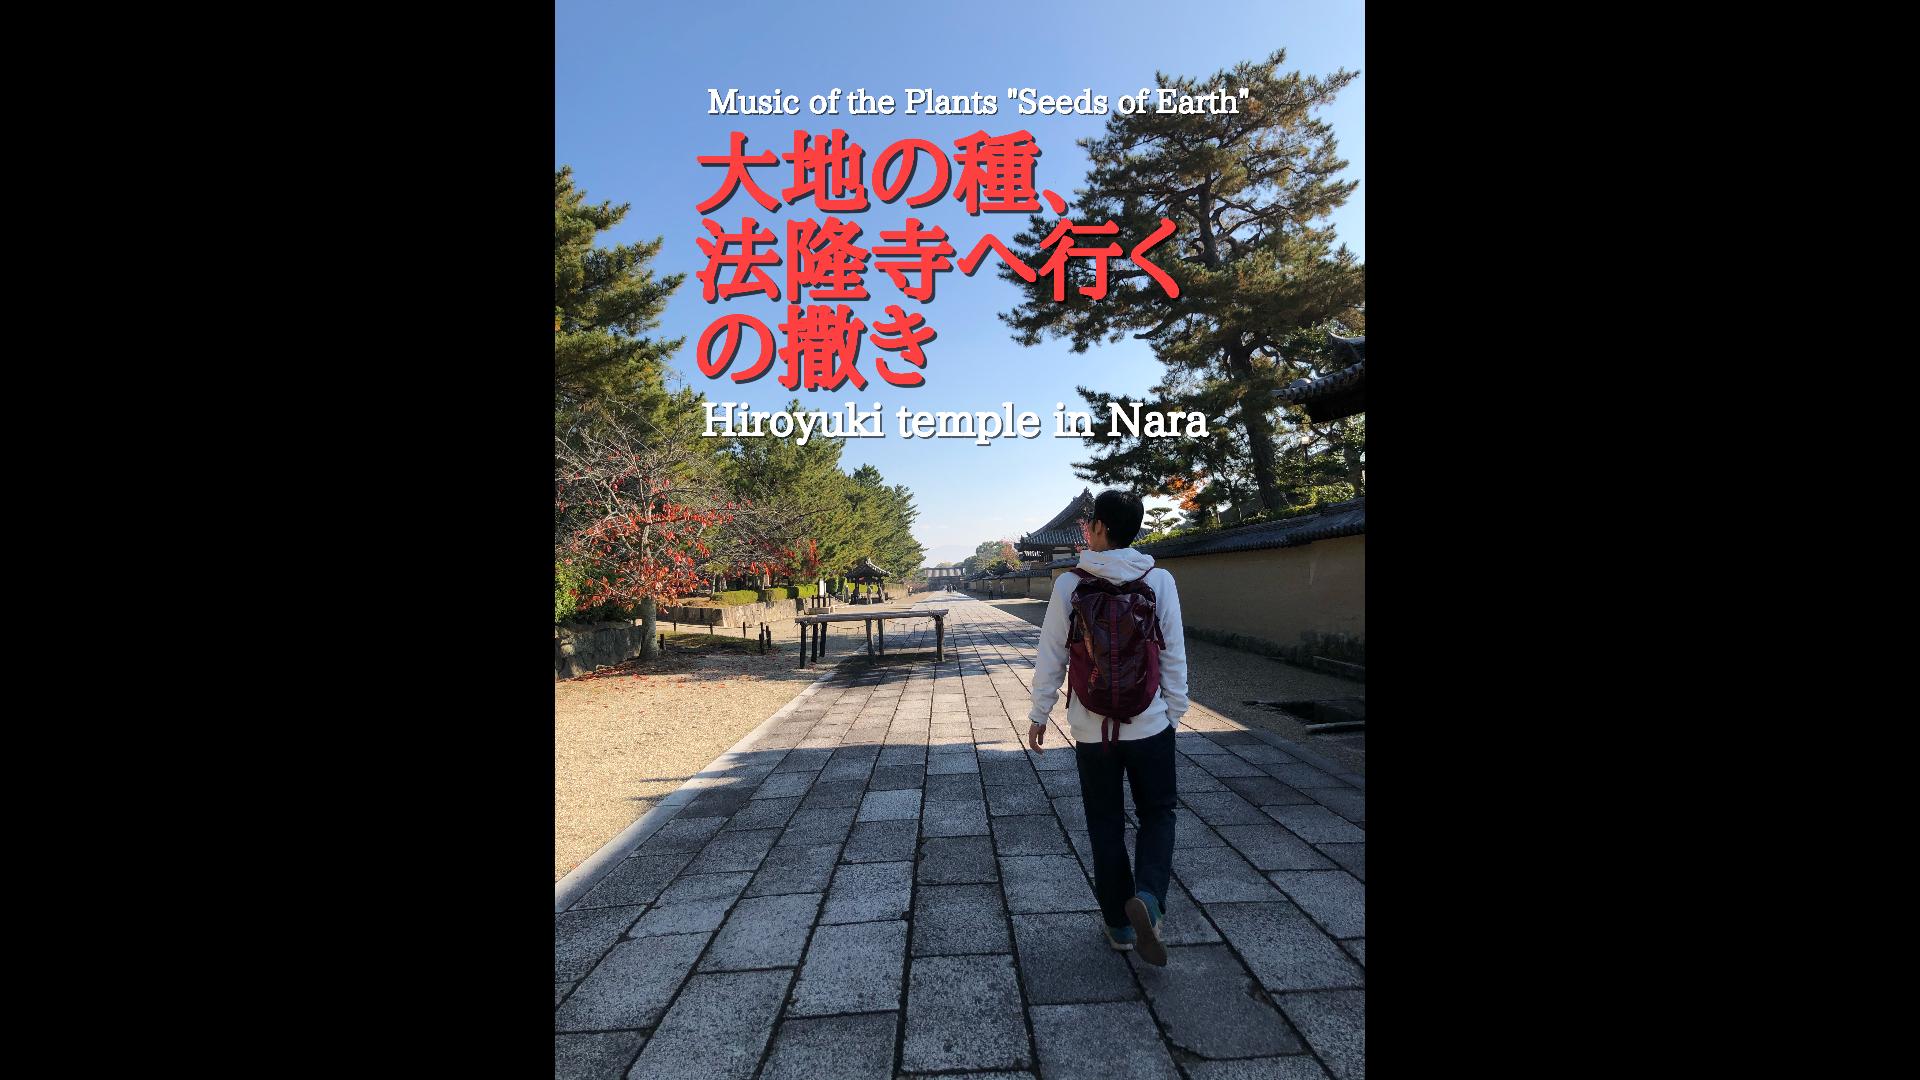 FC限定動画「大地の種、法隆寺へ行く気撒き」